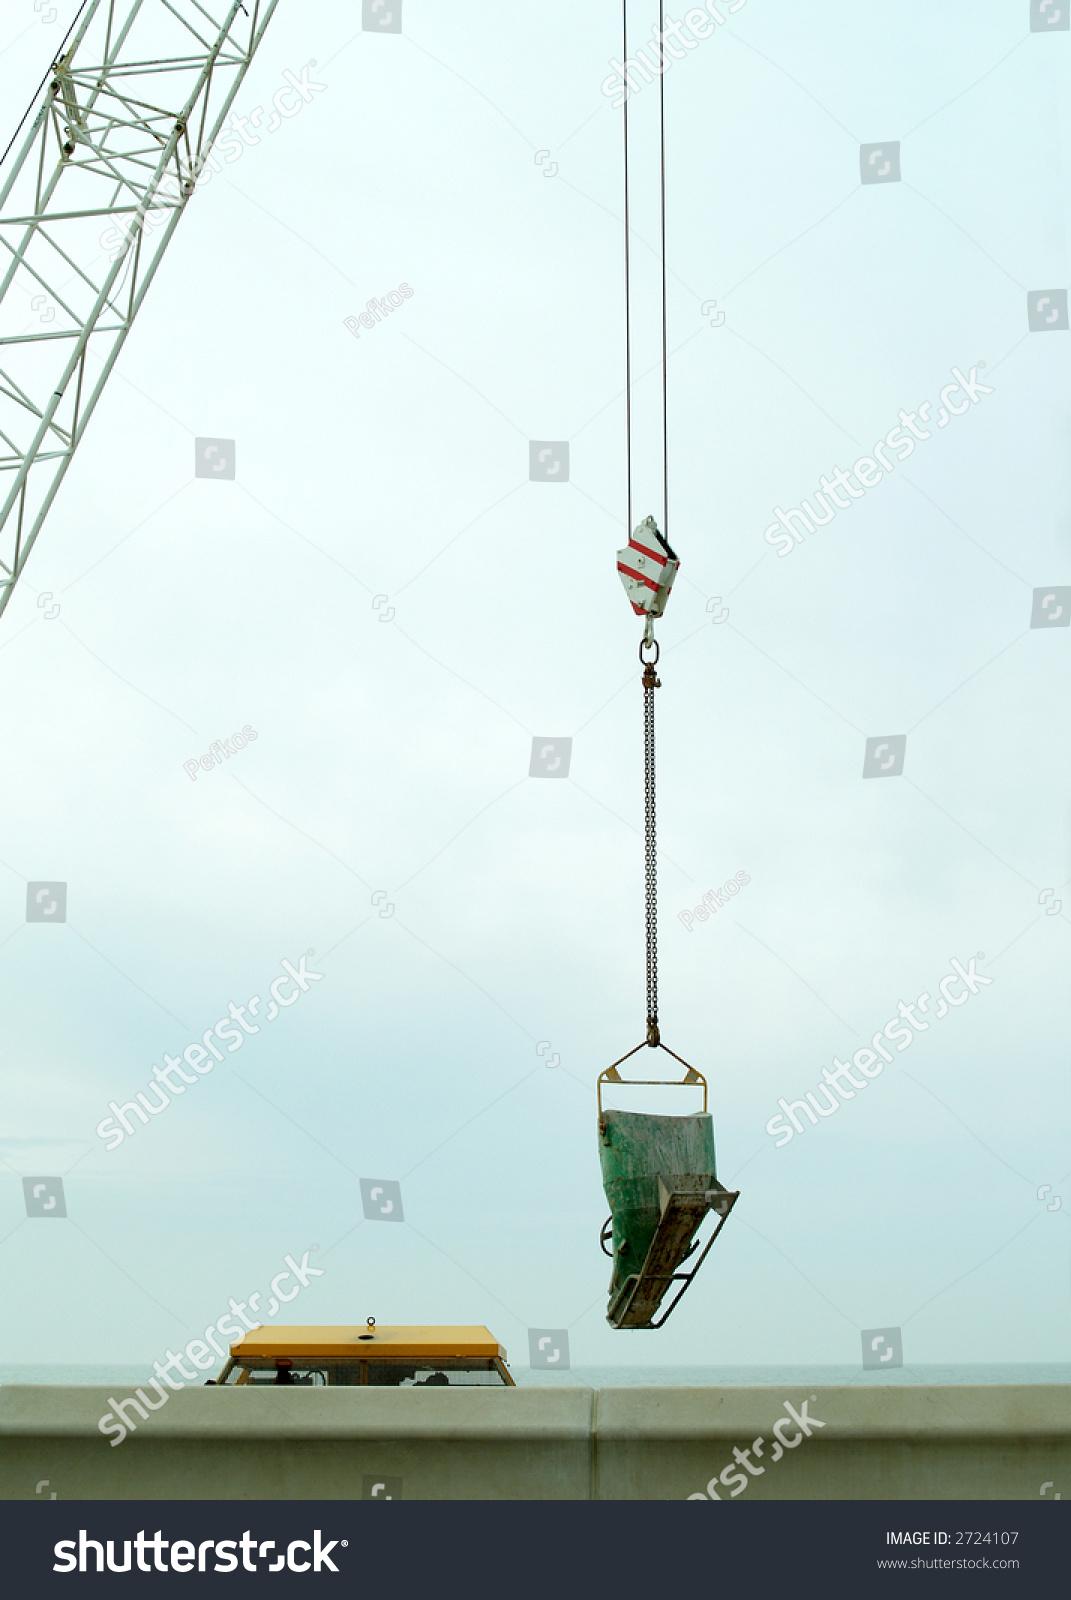 Concrete Hopper On Crane Stock Photo (Edit Now) 2724107